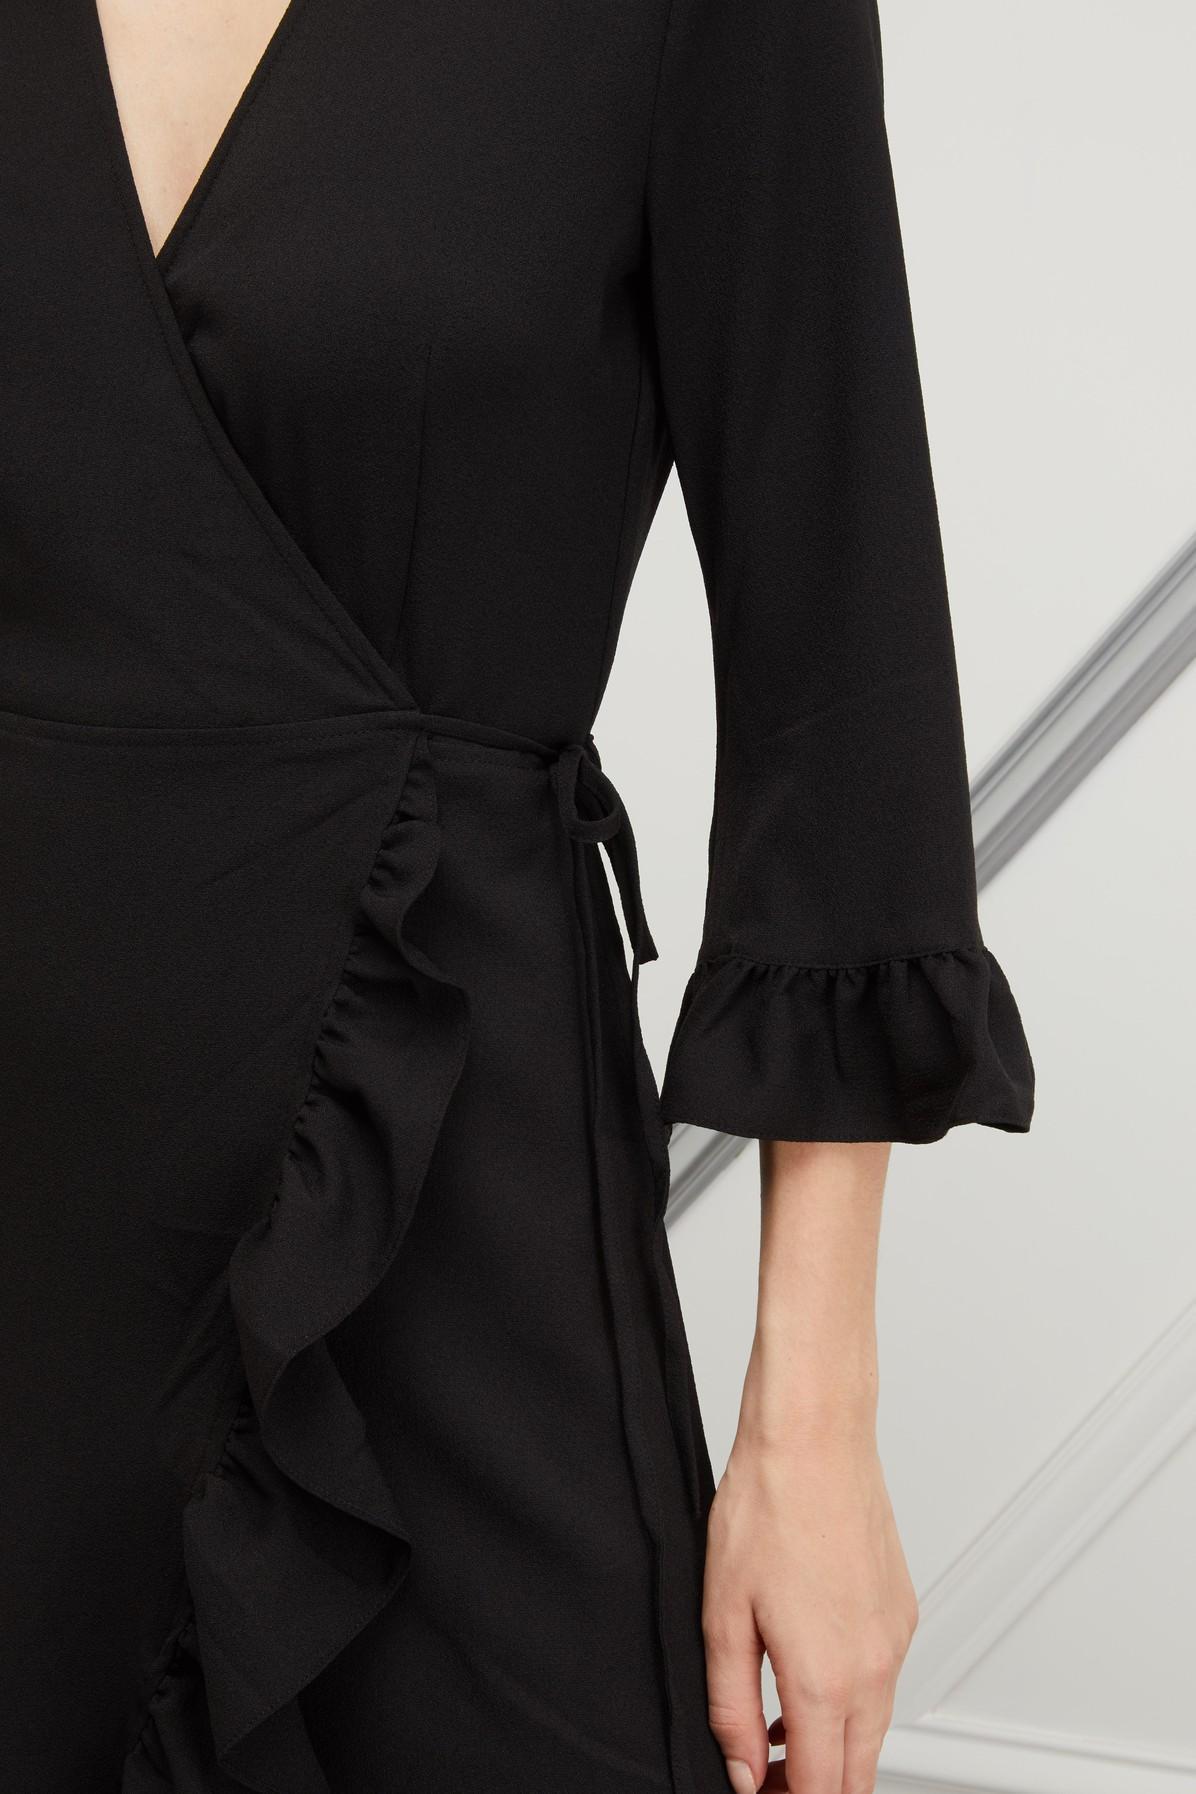 645c0d59 Ganni - Black Clark Wrap Dress - Lyst. View fullscreen